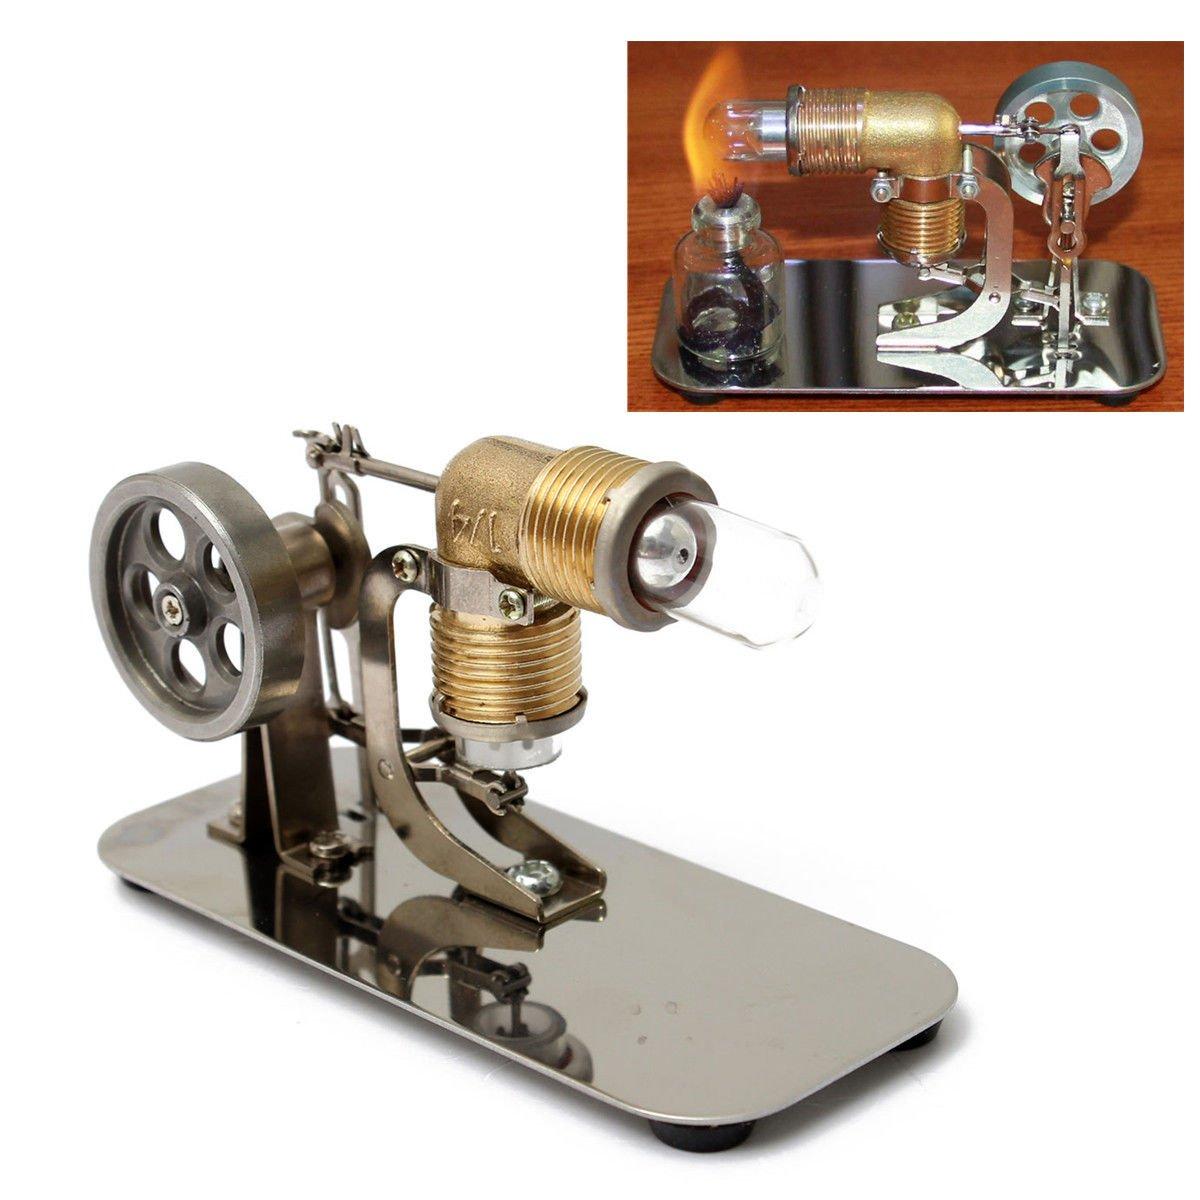 Mini Hot Air Stirling Engine Motor Model Educational Kit, Electricity Generator Drive Kit - Gift US